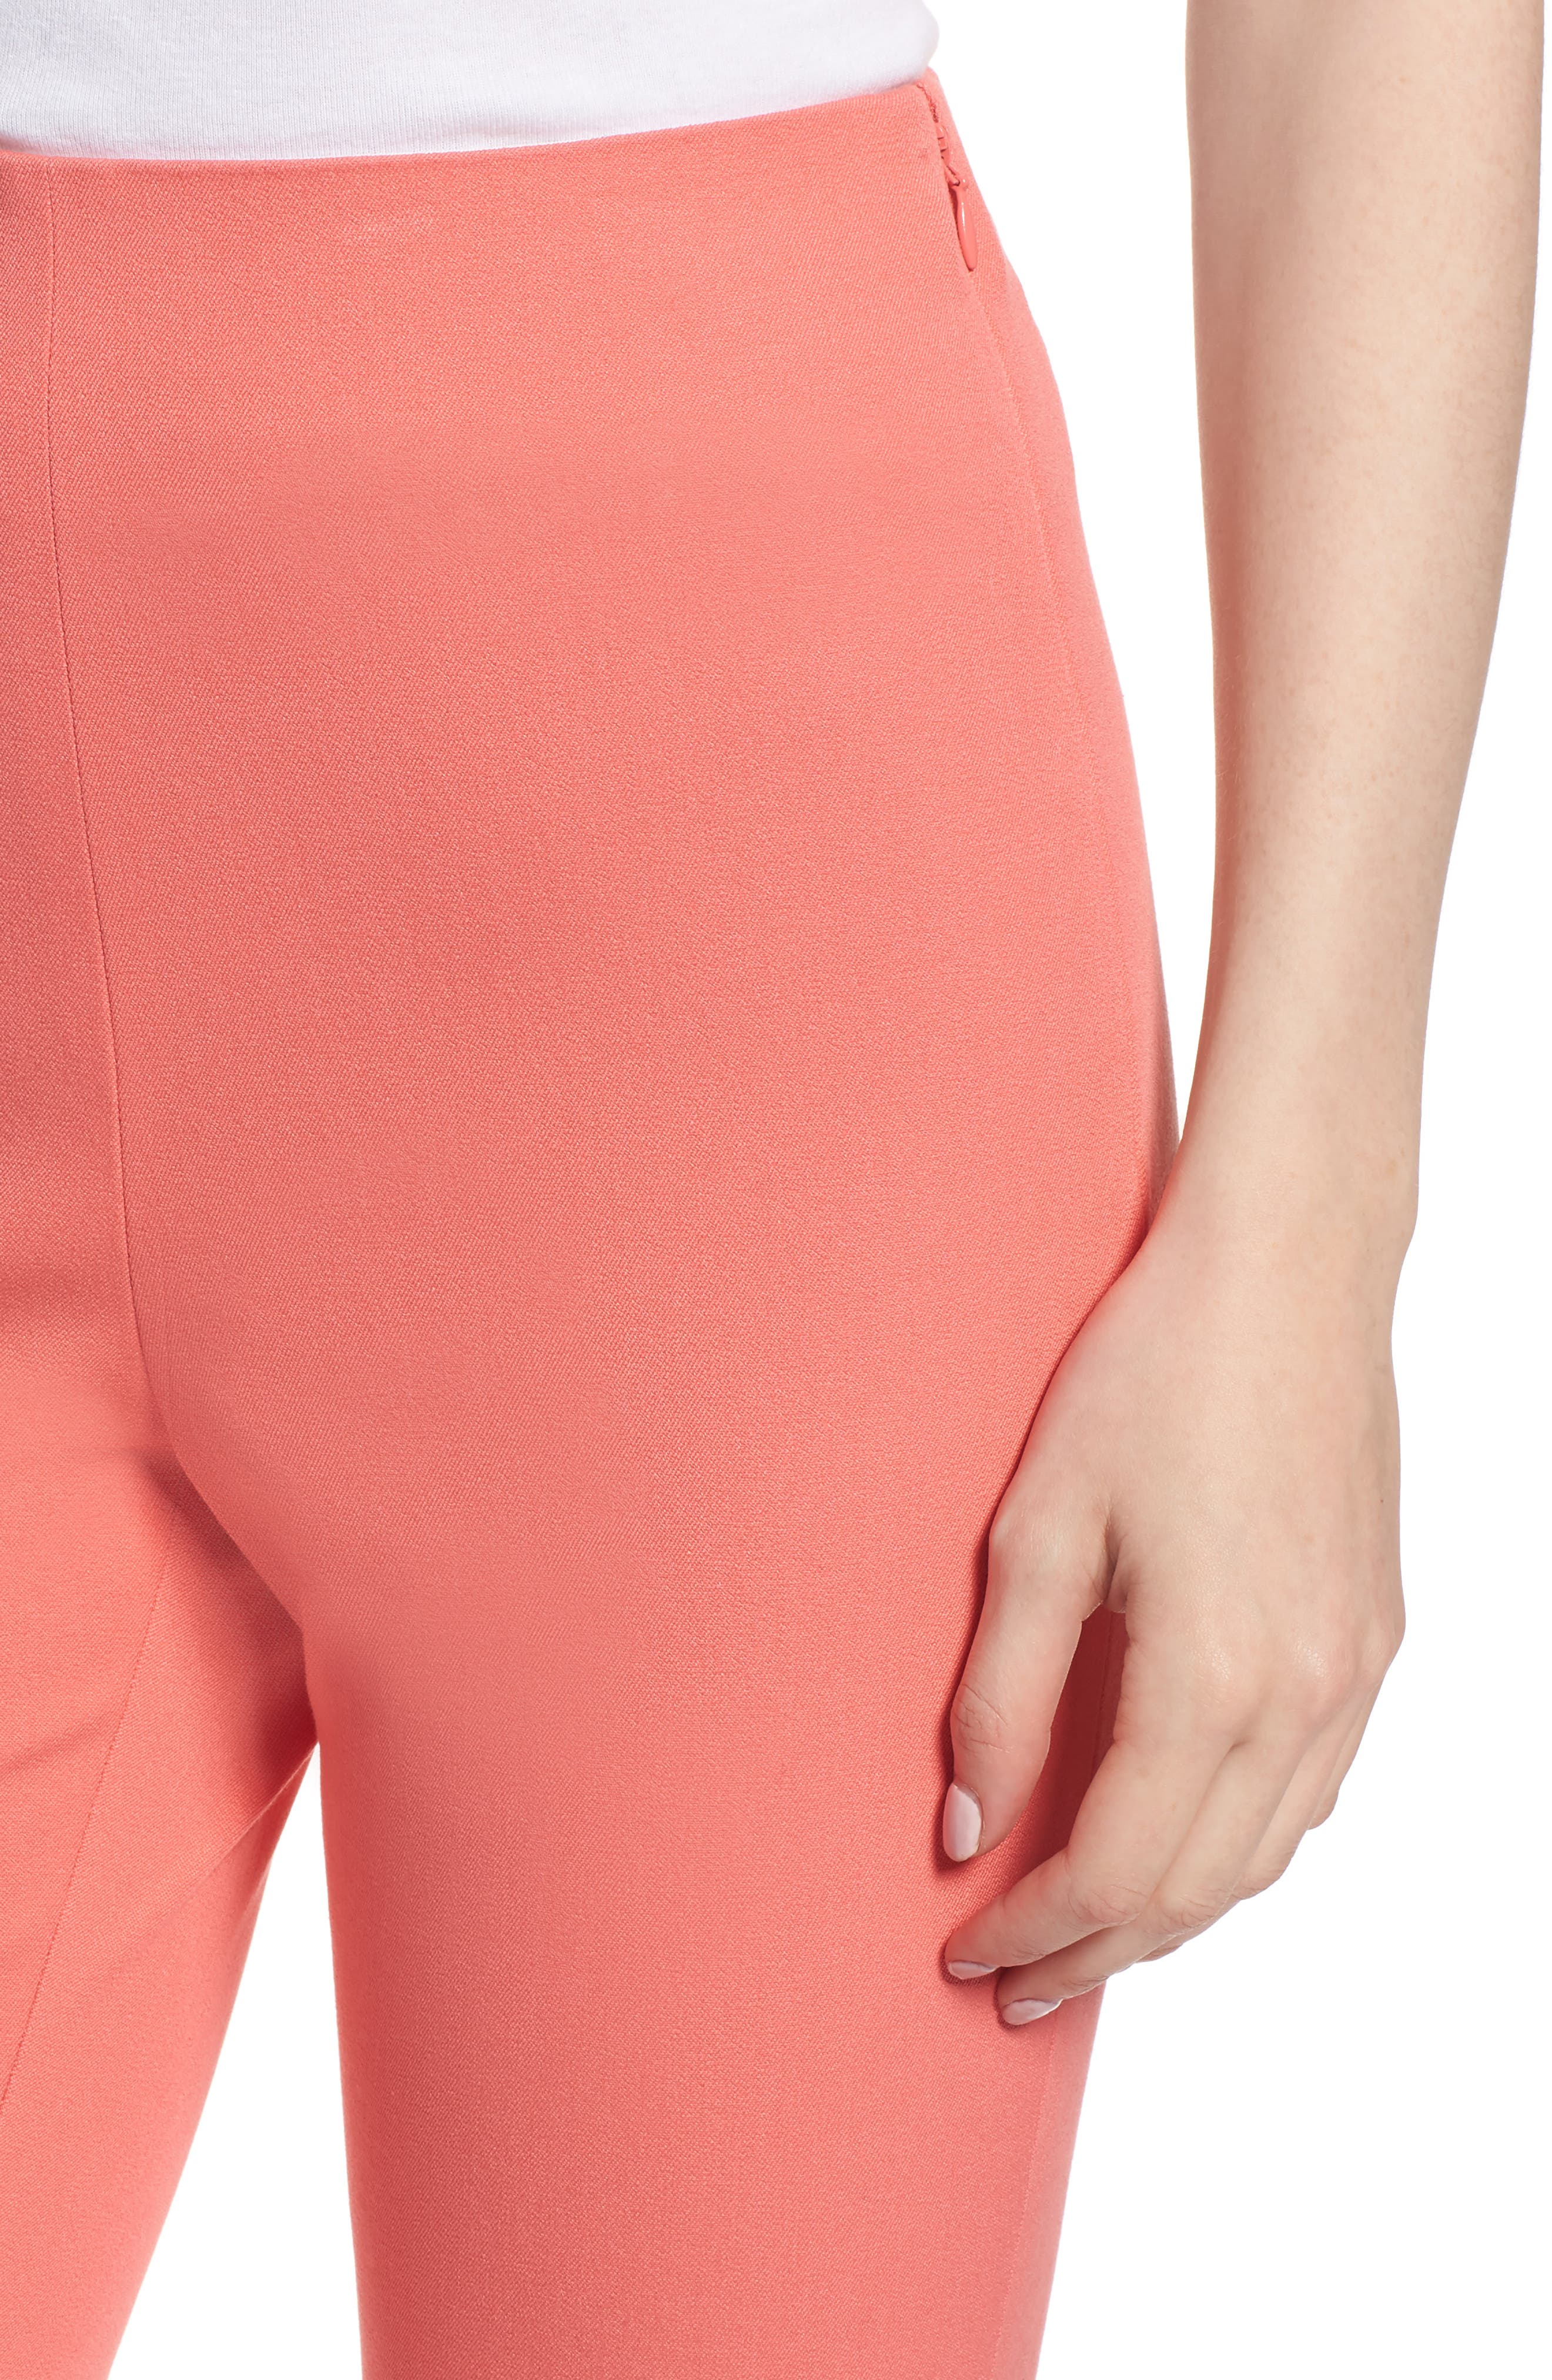 Skinny Stretch Pants,                             Alternate thumbnail 4, color,                             Coral Sugar